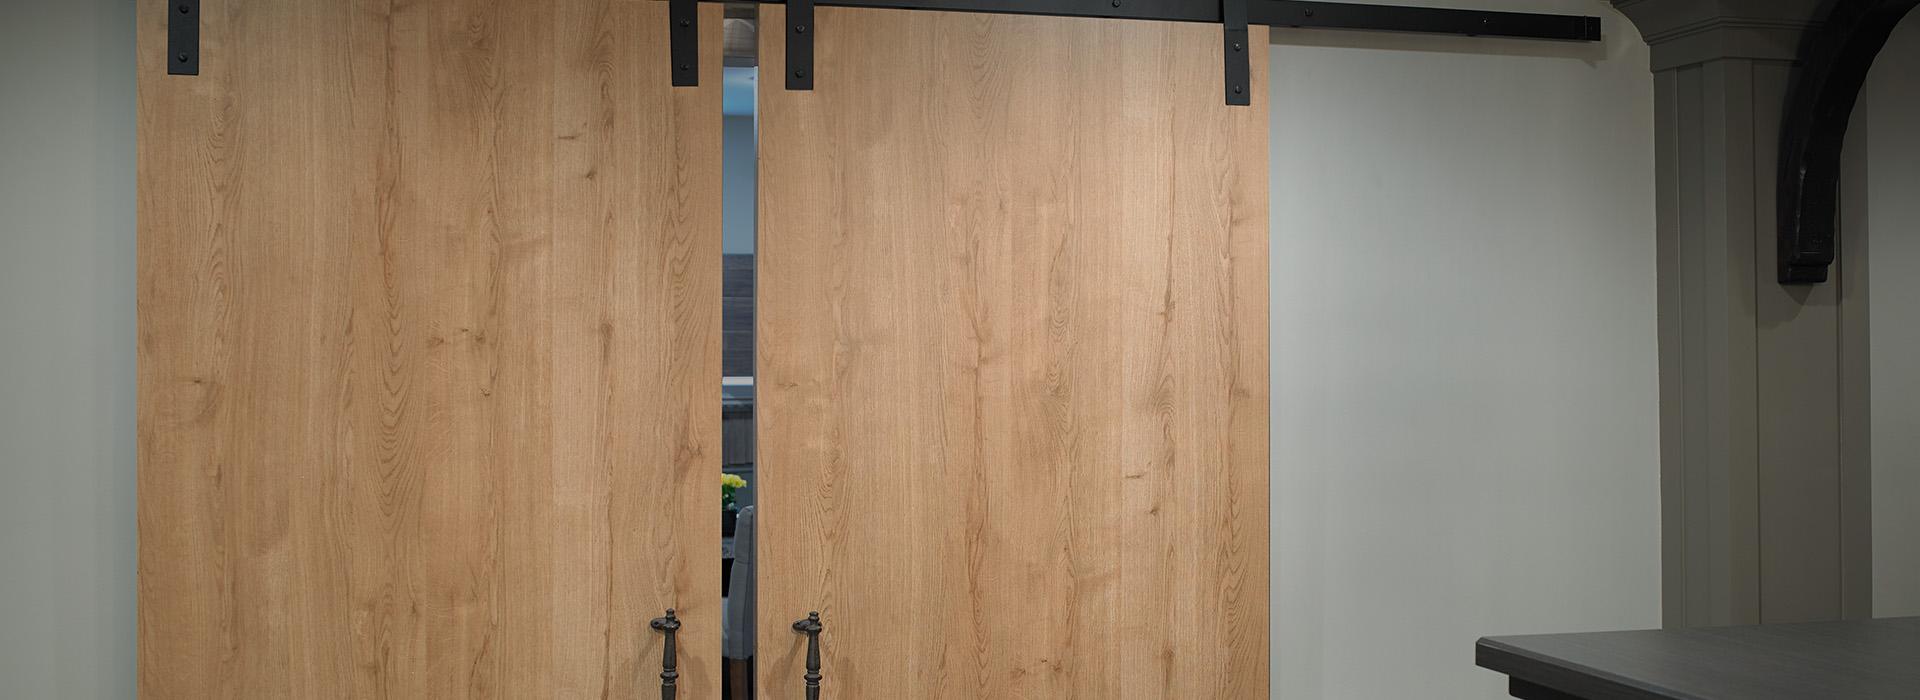 Formica® Brand Laminate Doors 9312-NG Planked Urban Oak